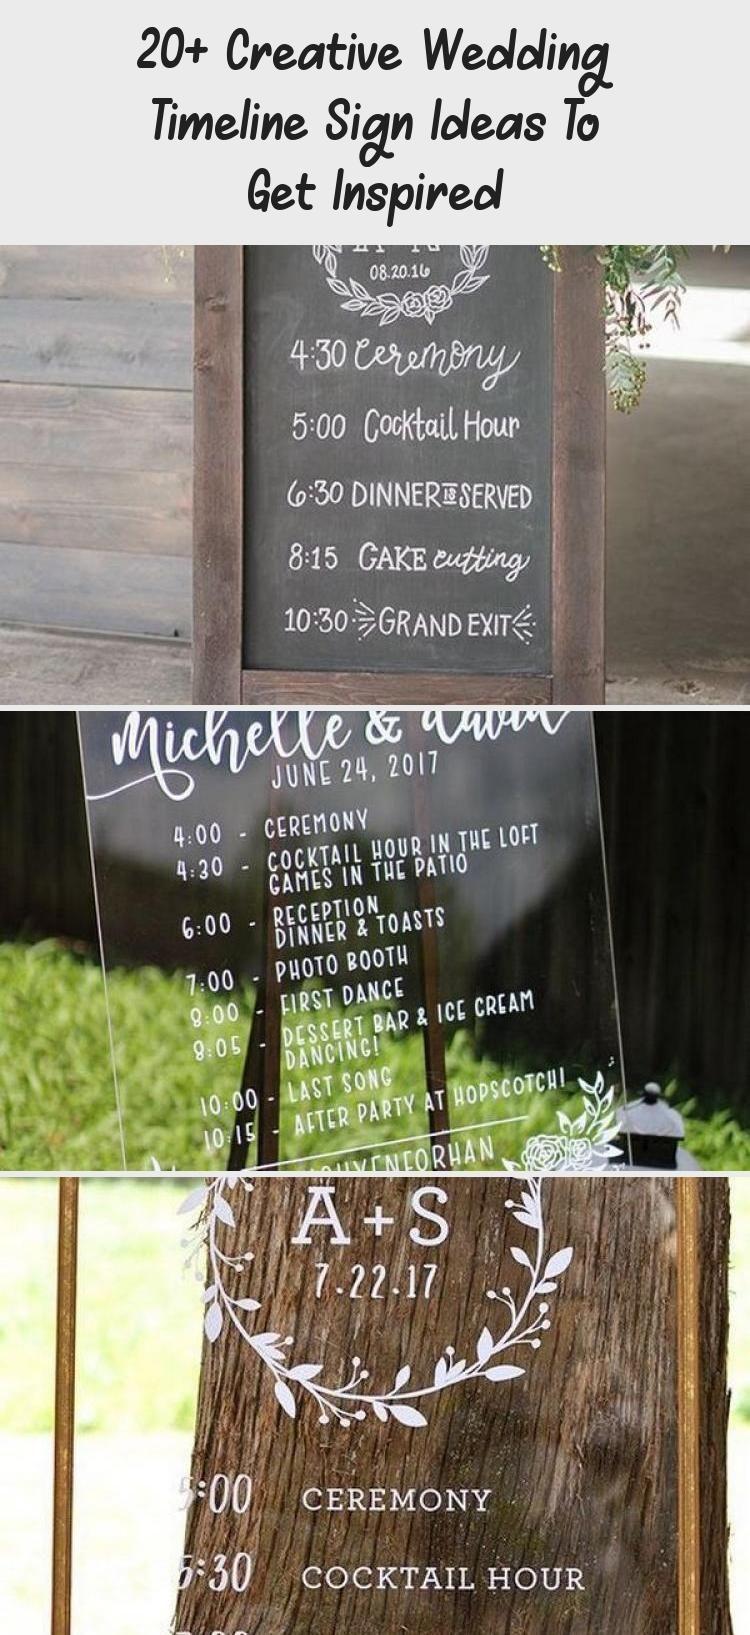 20 Creative Wedding Timeline Sign Ideas To Get Inspired In 2020 Wedding Timeline Rustic Wedding Outdoor Wedding